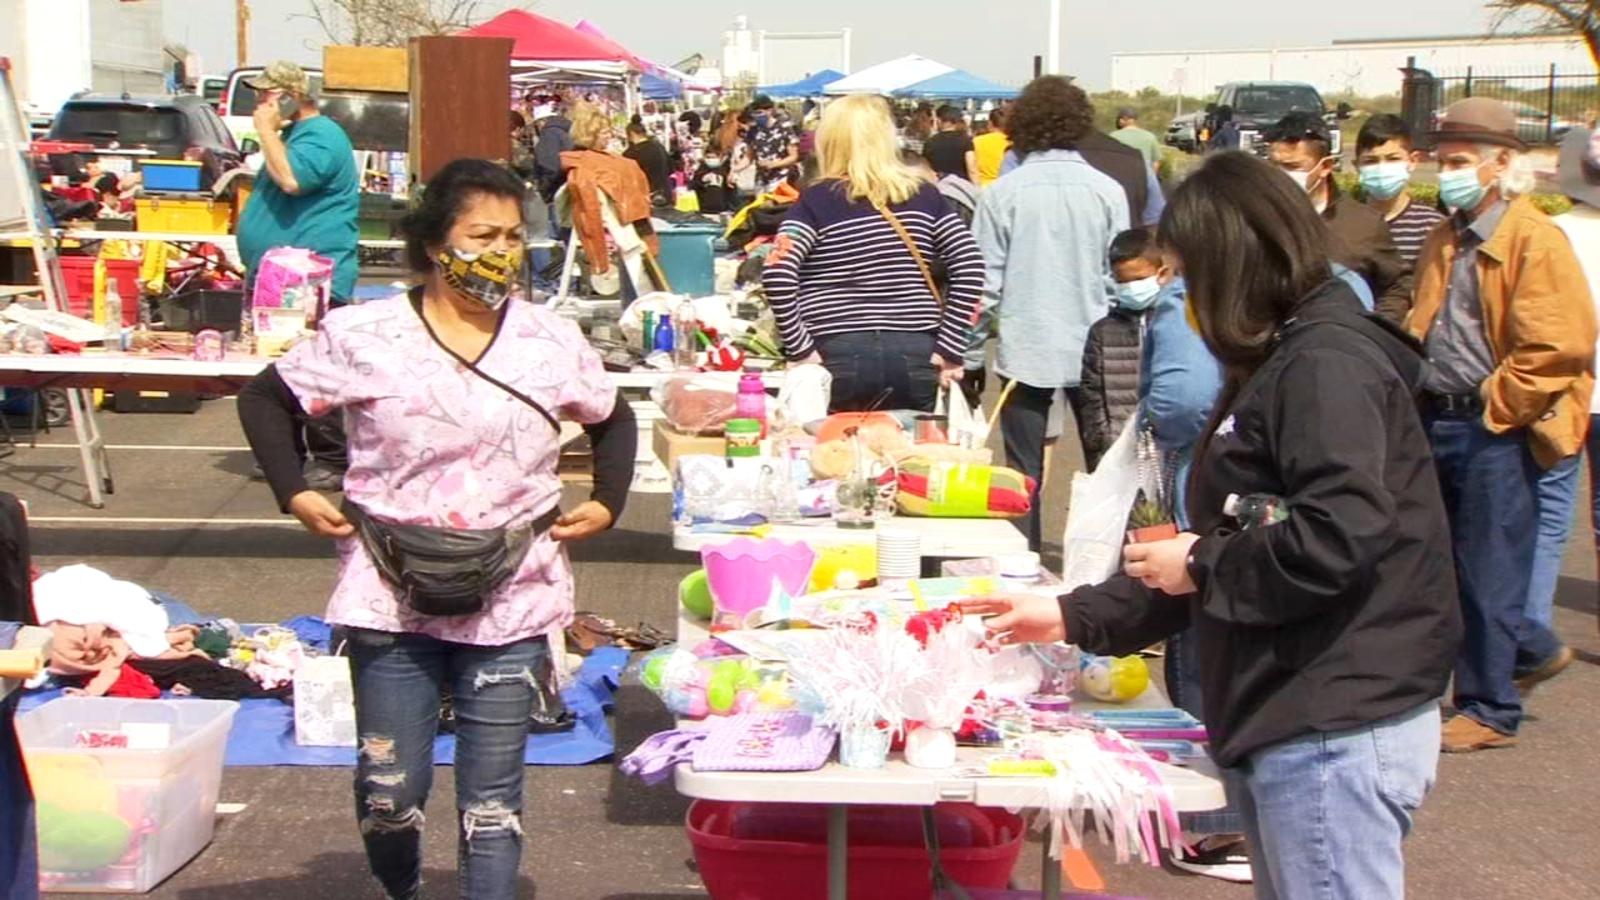 Fresno Swap Meet holds grand opening in northwest Fresno - ABC30 Fresno